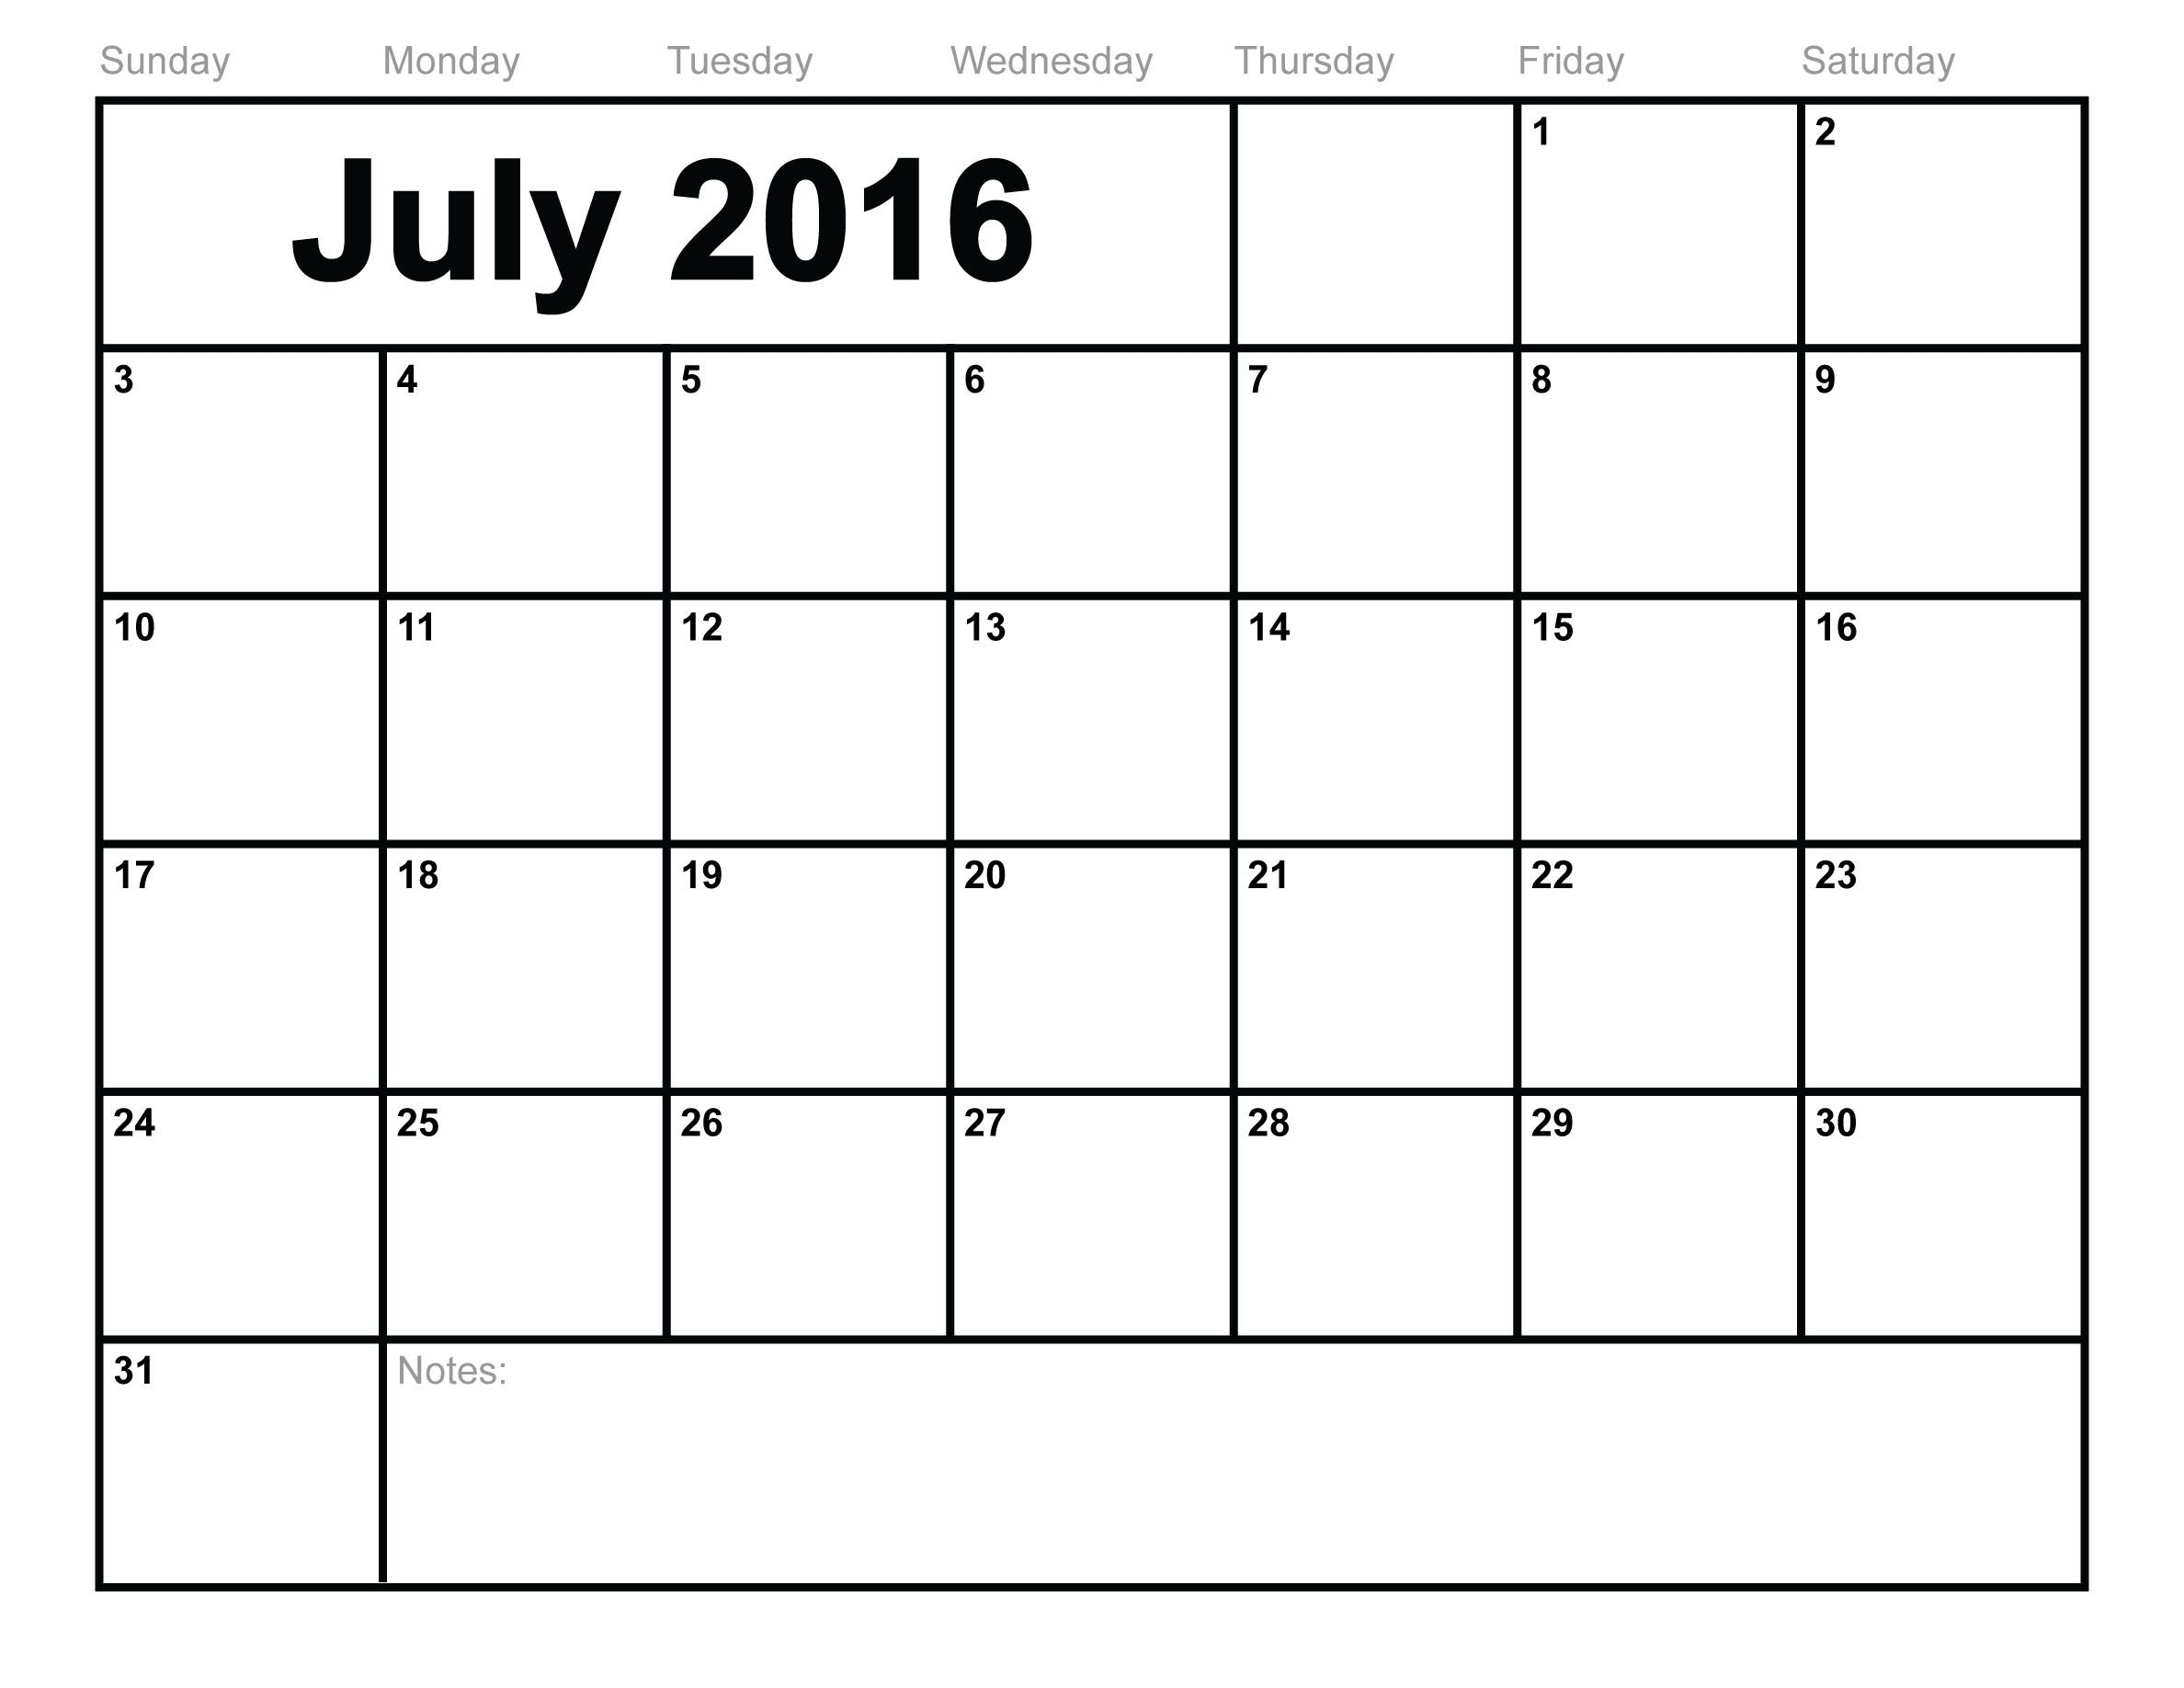 Free July 2016 Printable Calendar | Printable Calendar July pertaining to July 2016 Calendar With Holidays